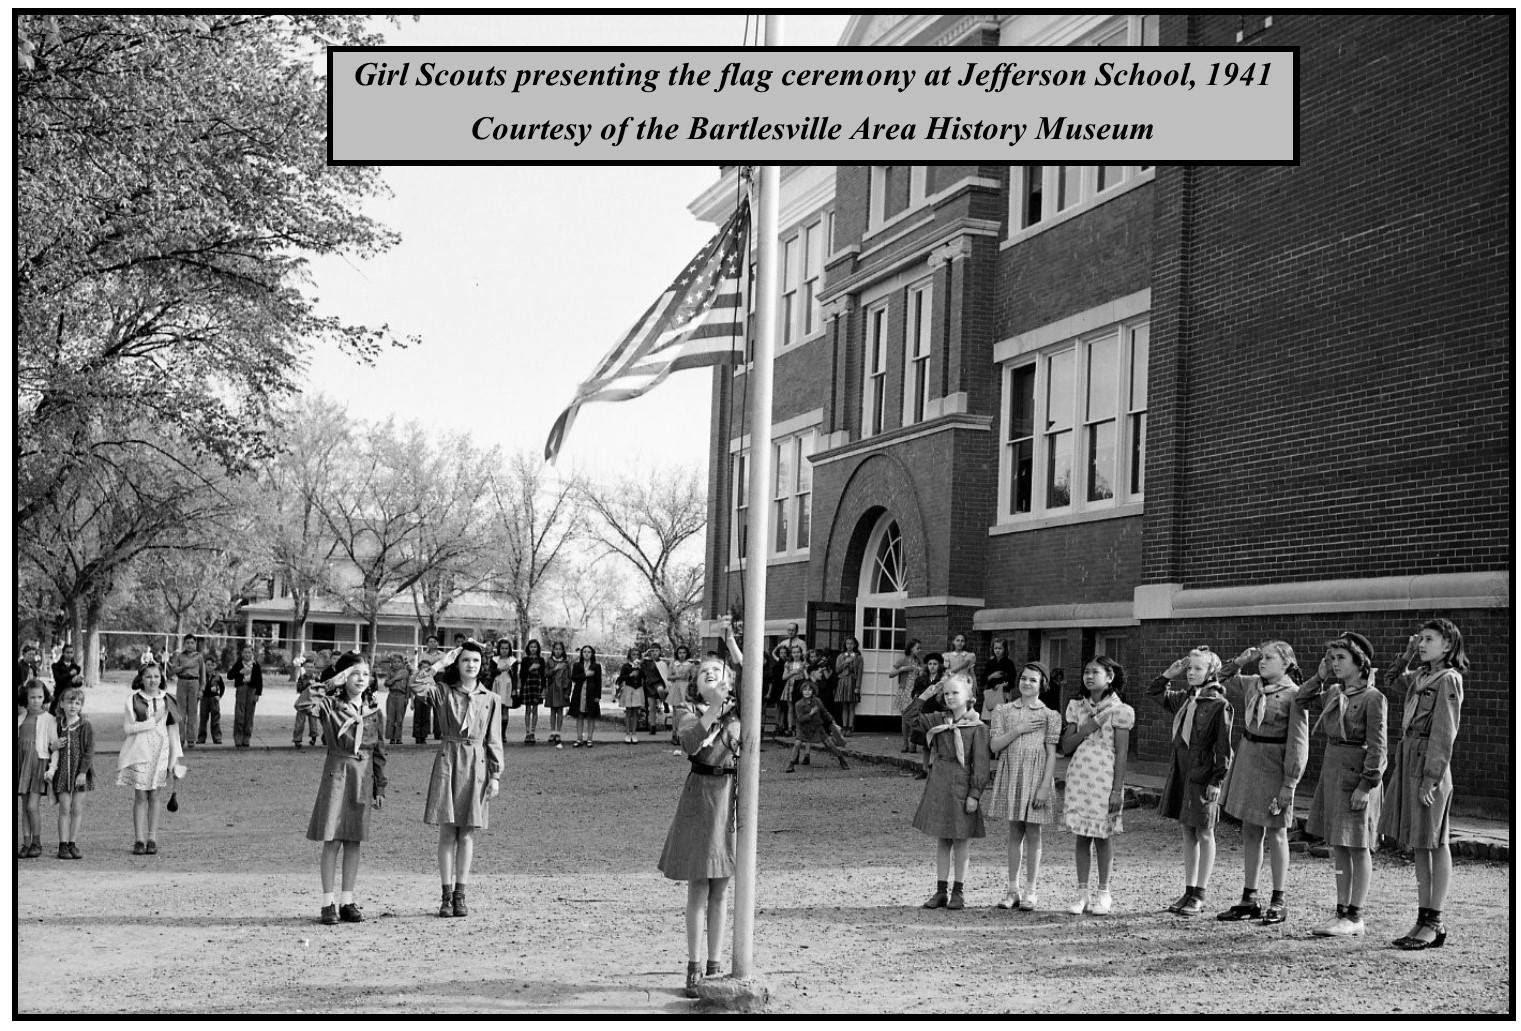 Raising the Flag in 1941